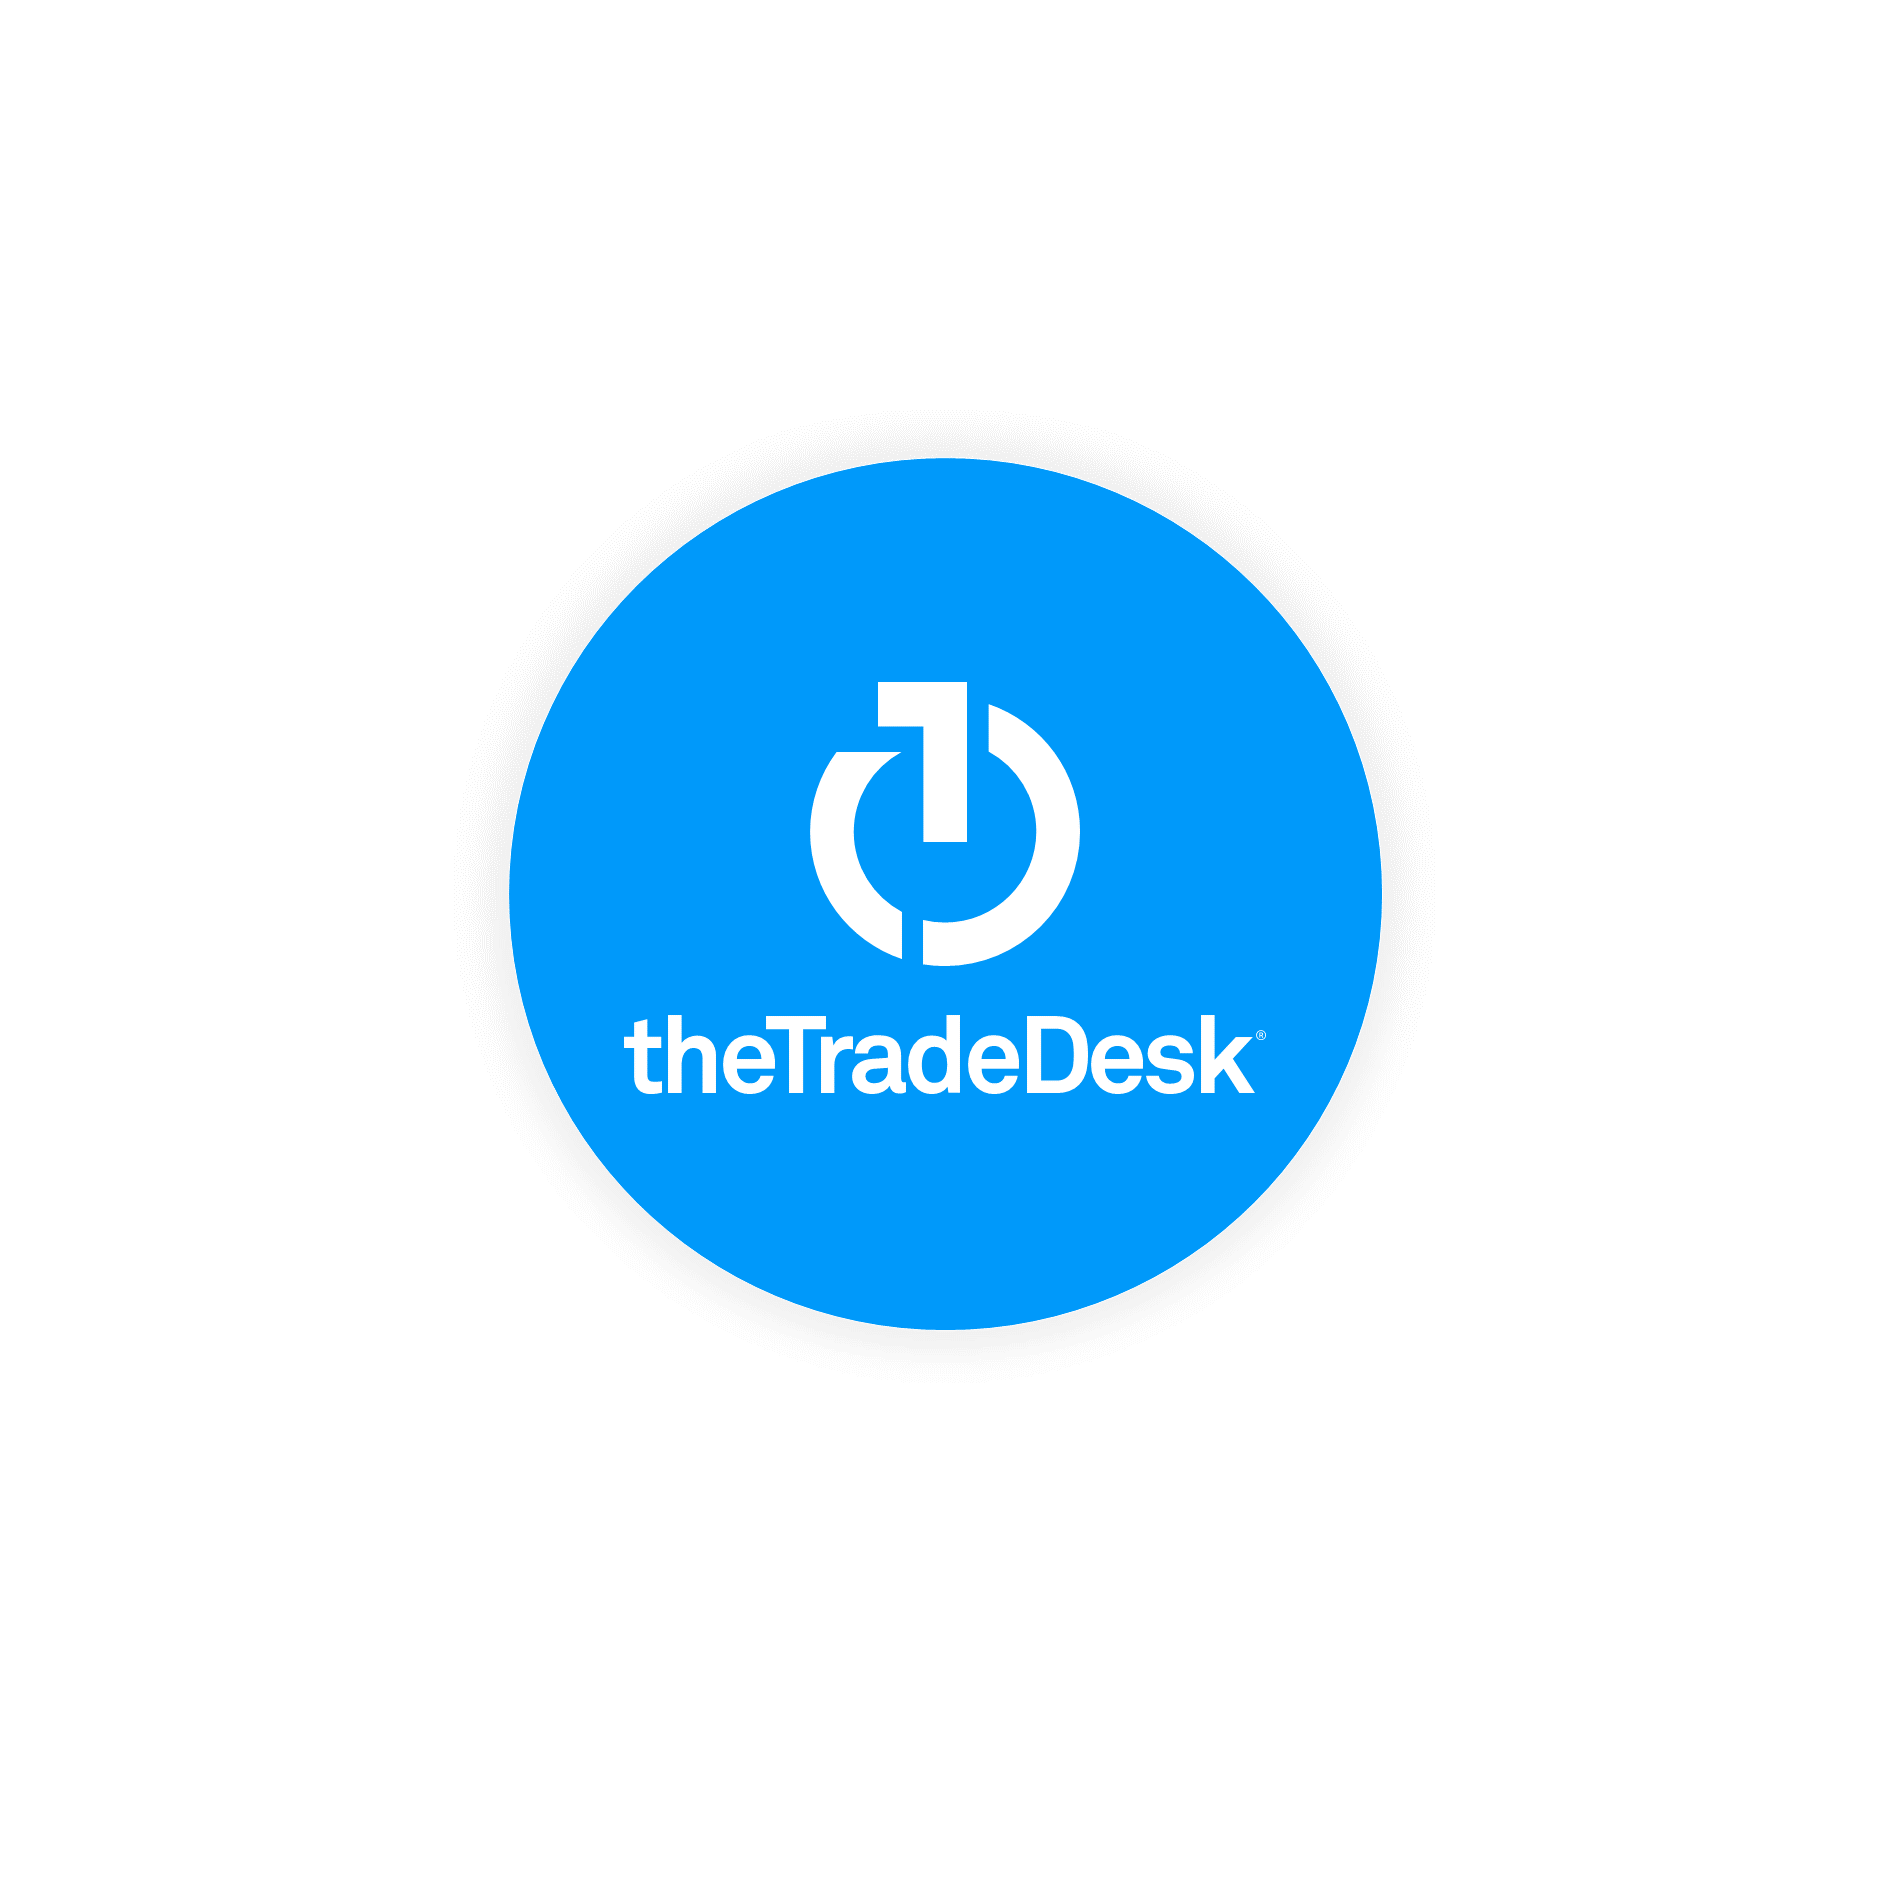 notoriété de marque - The trade desk